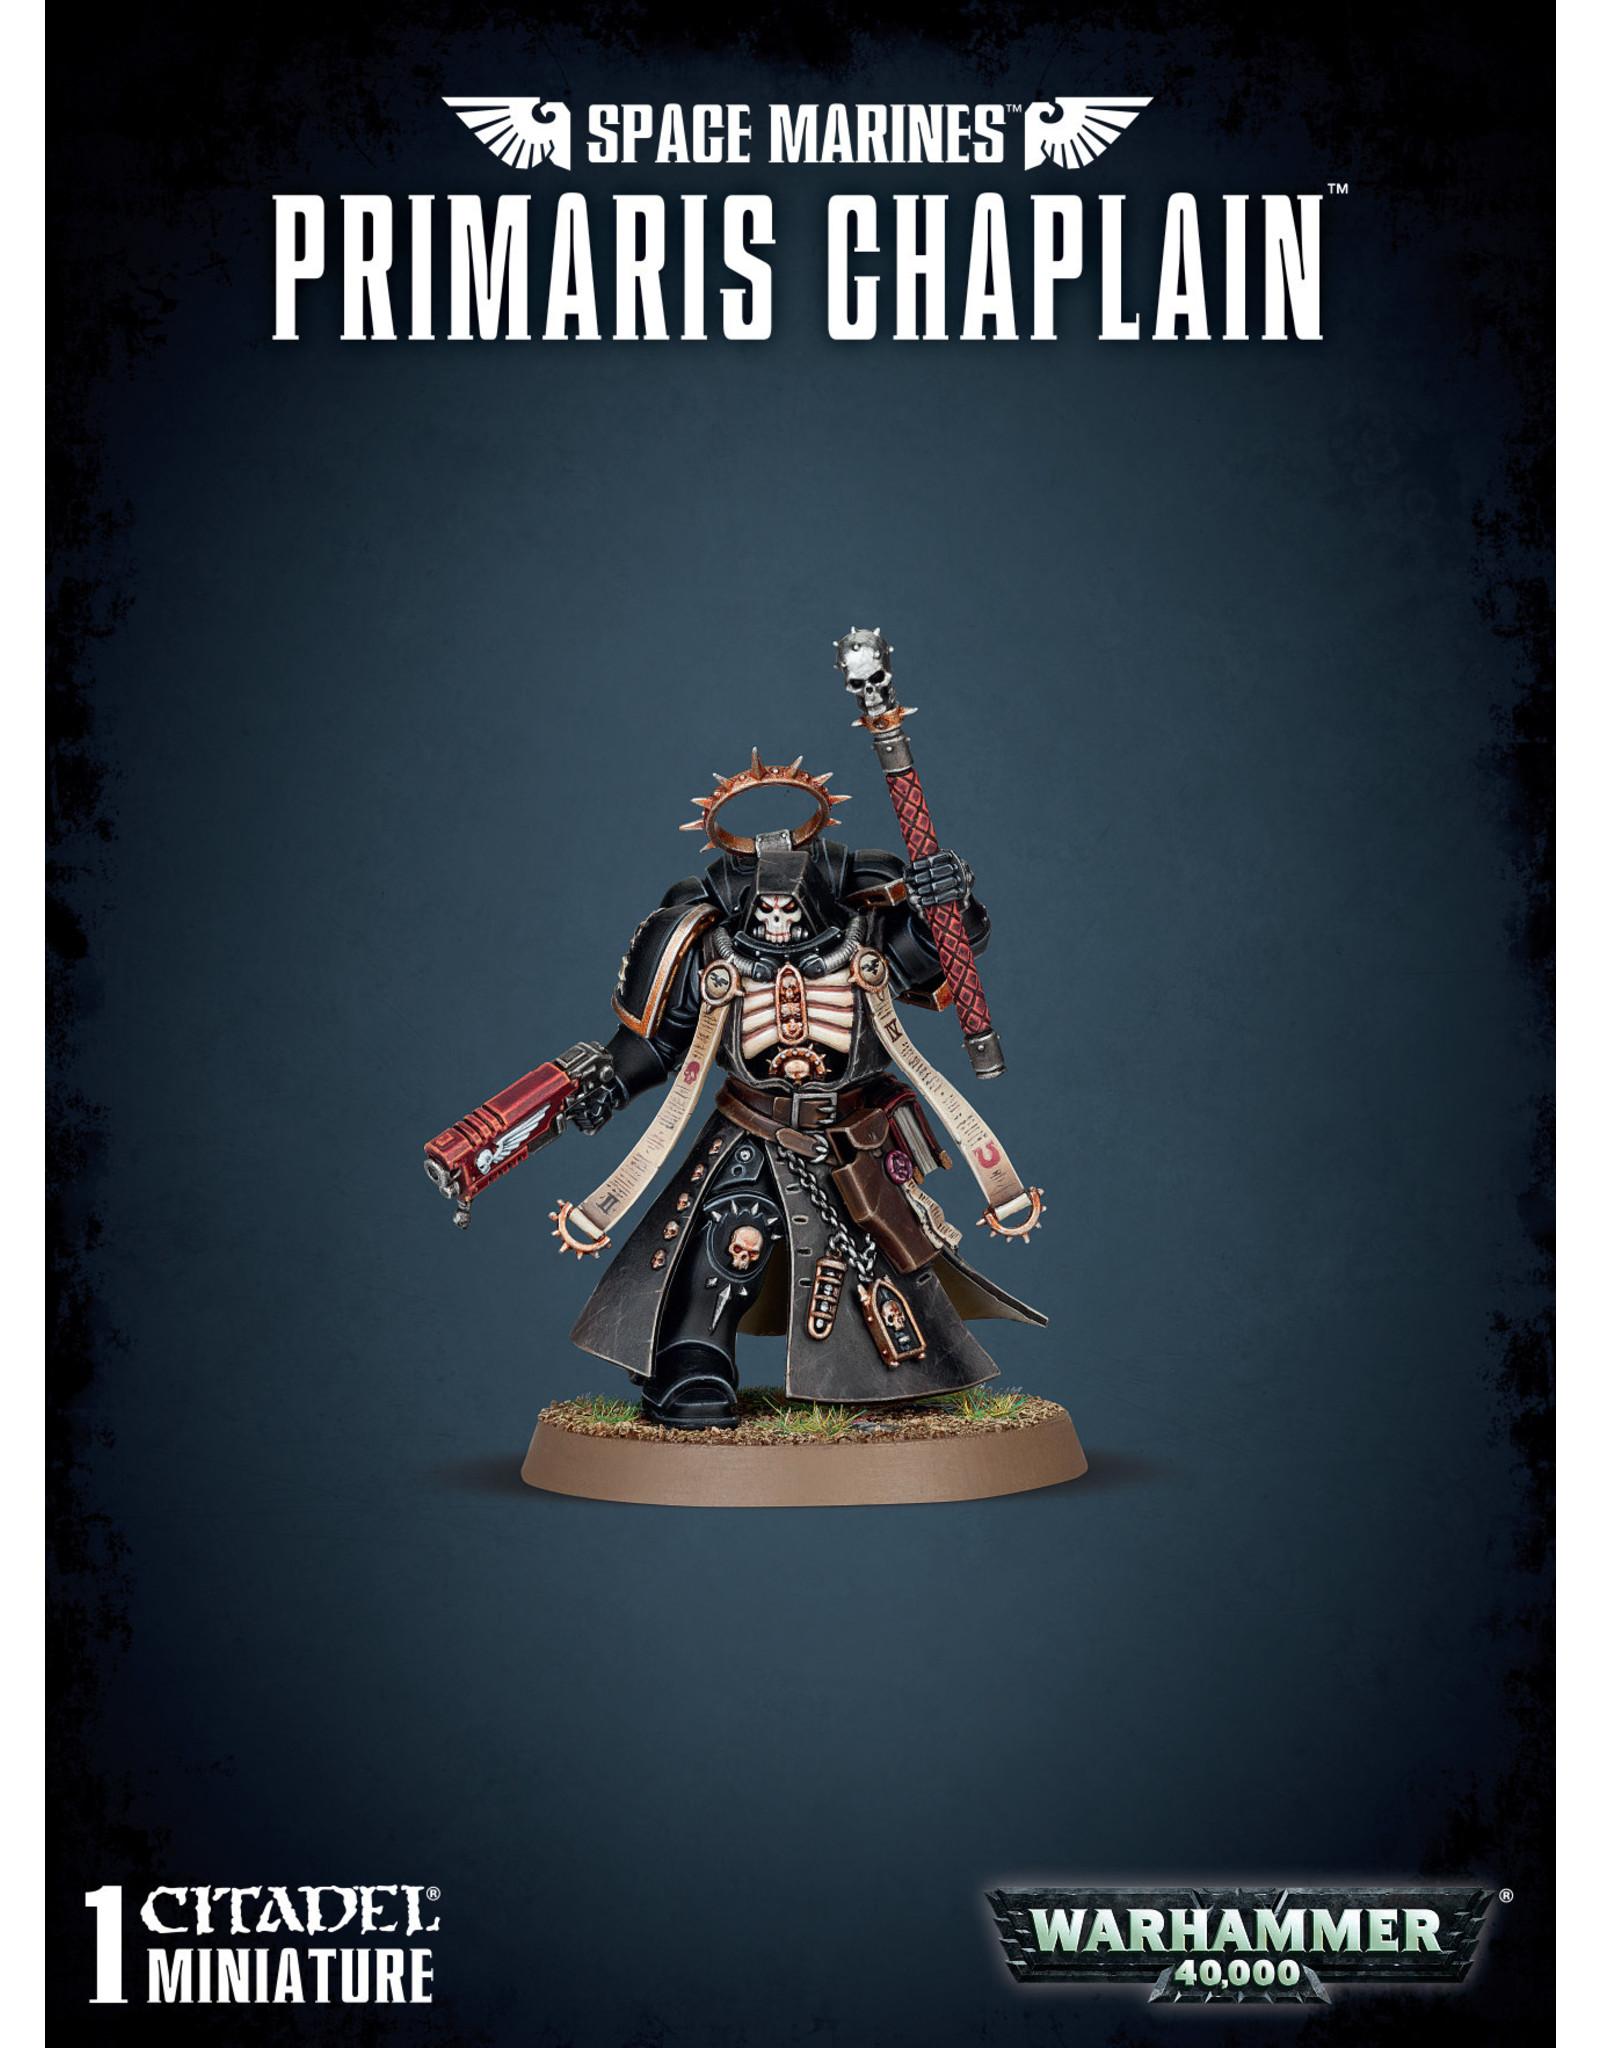 Warhammer 40k SPACE MARINES PRIMARIS CHAPLAIN